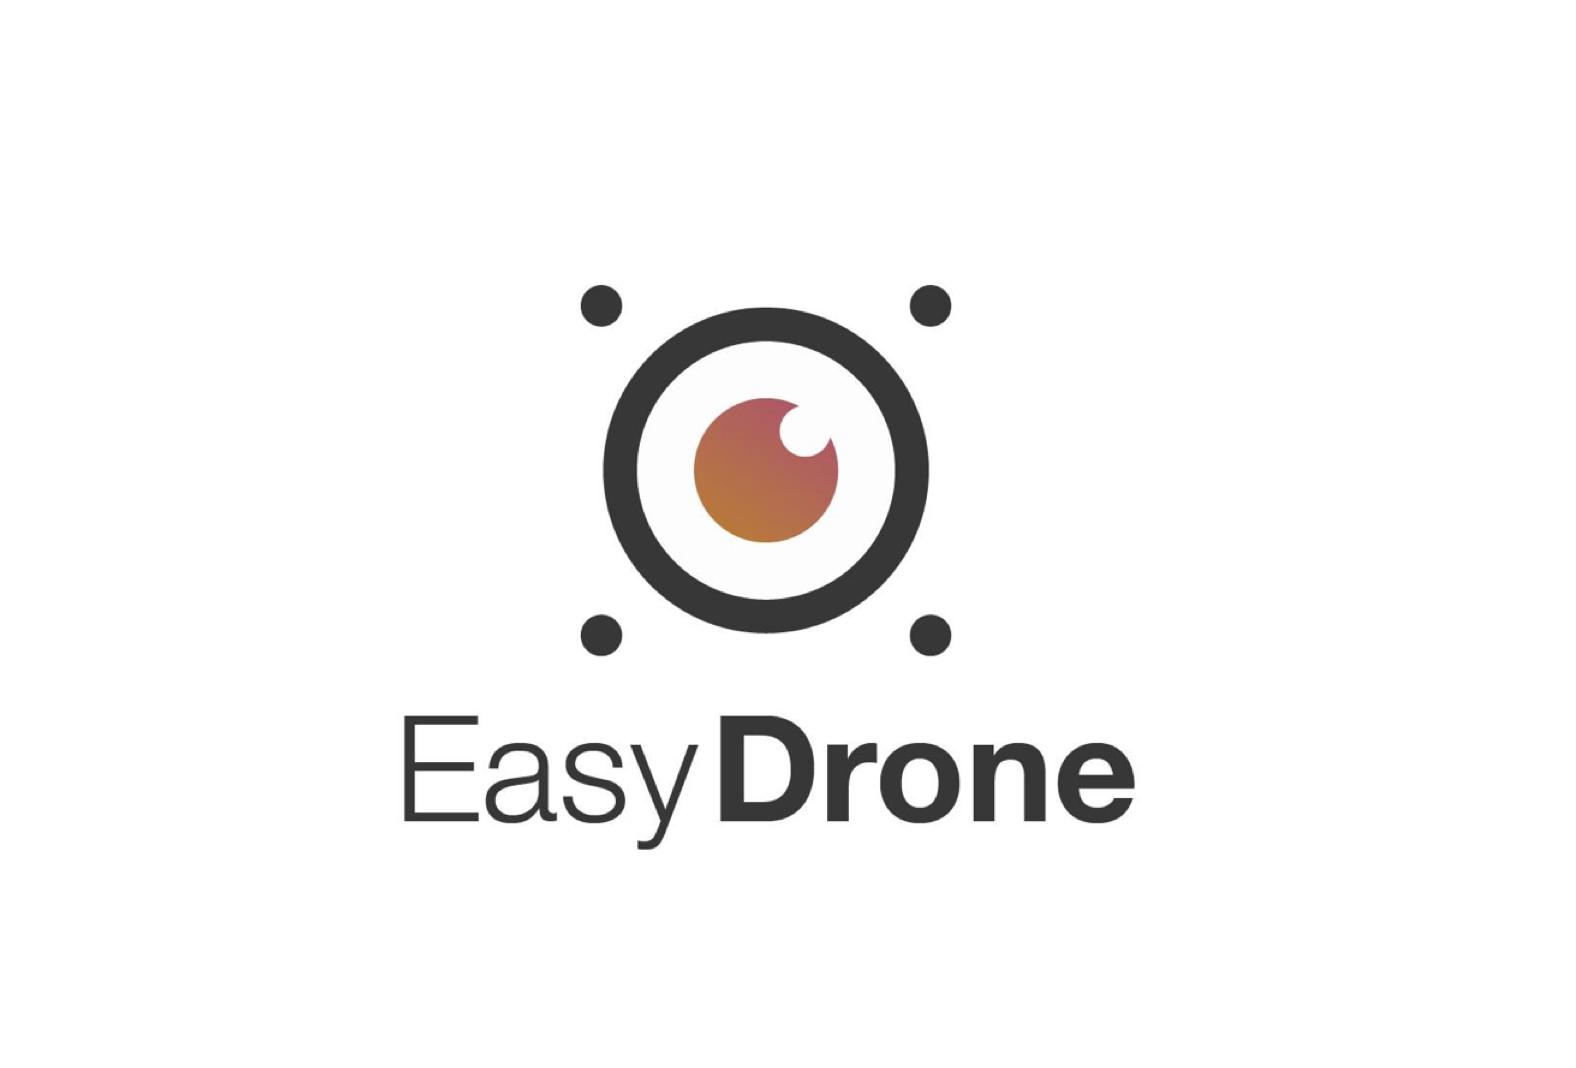 Easydrone logo